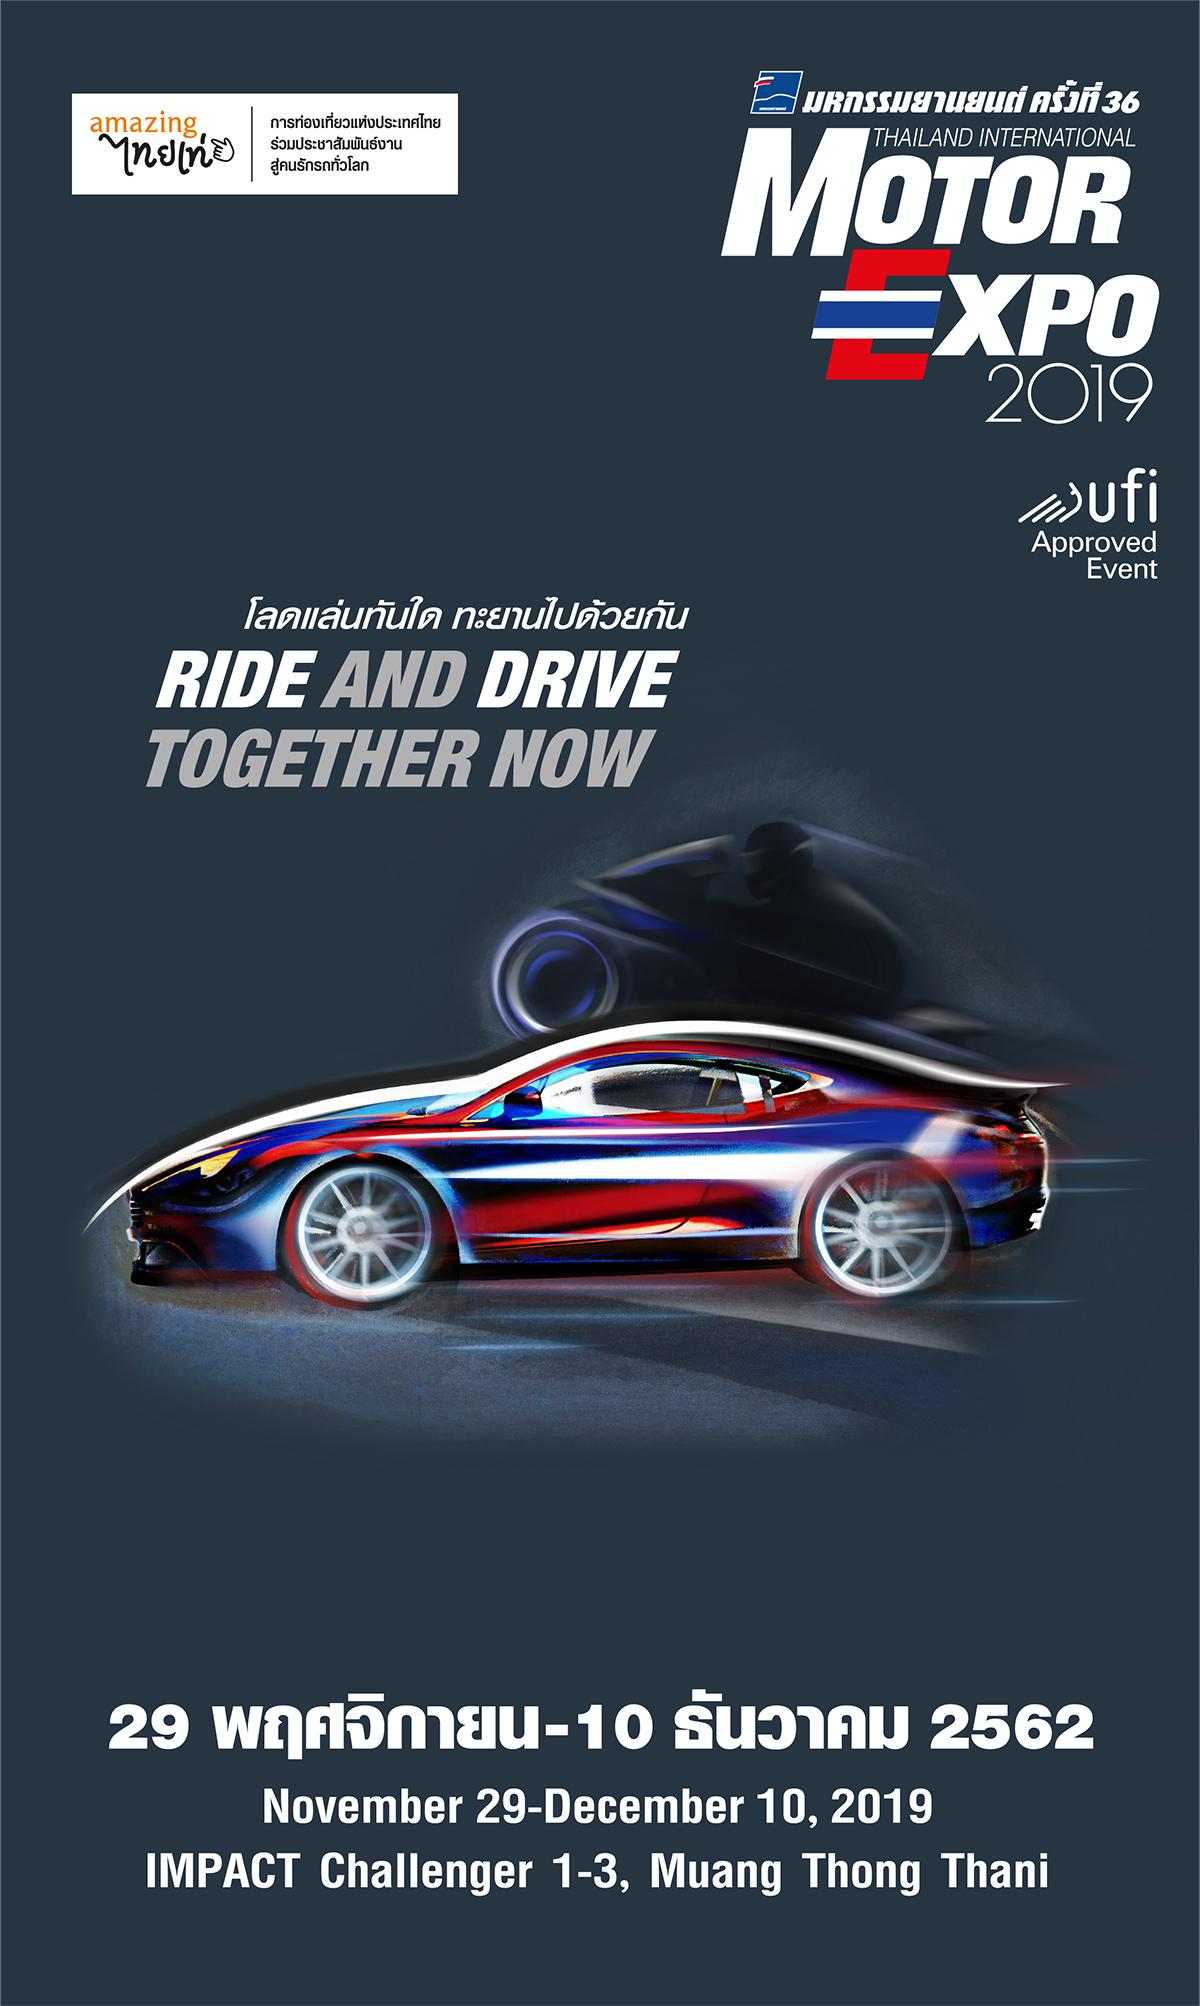 MotorExpo 2019,MOTOR EXPO 2019,มหกรรมยานยนต์ ครั้งที่ 36,โลดแล่นทันใด ทะยานไปด้วยกัน